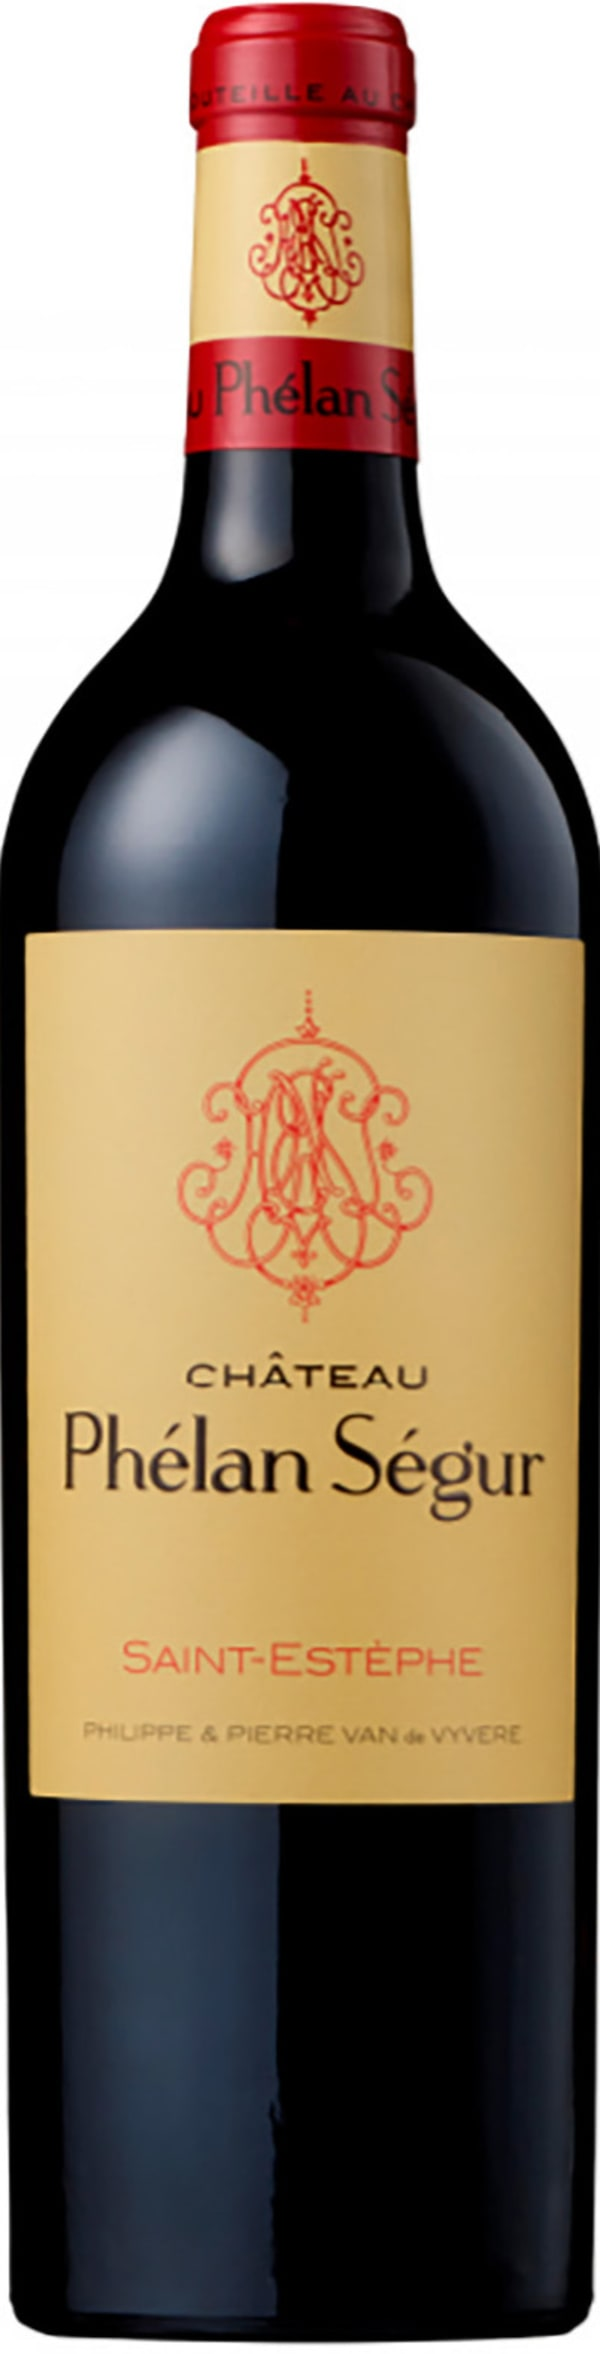 Château Phélan Ségur 2015